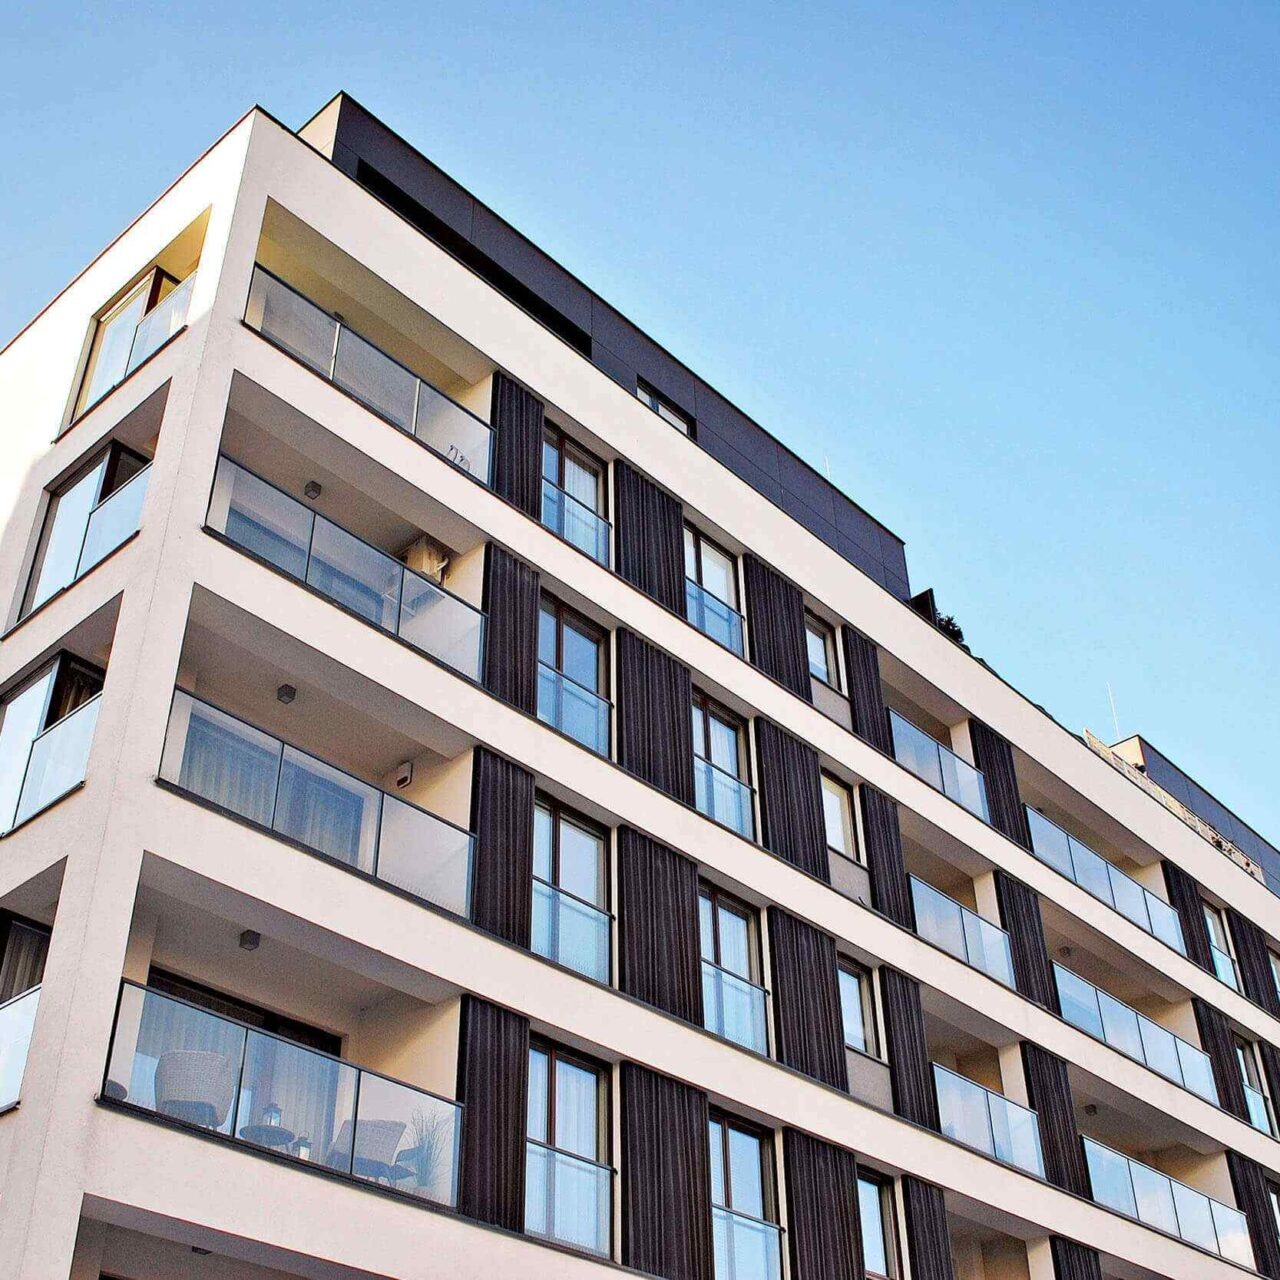 Partnering development of student housing